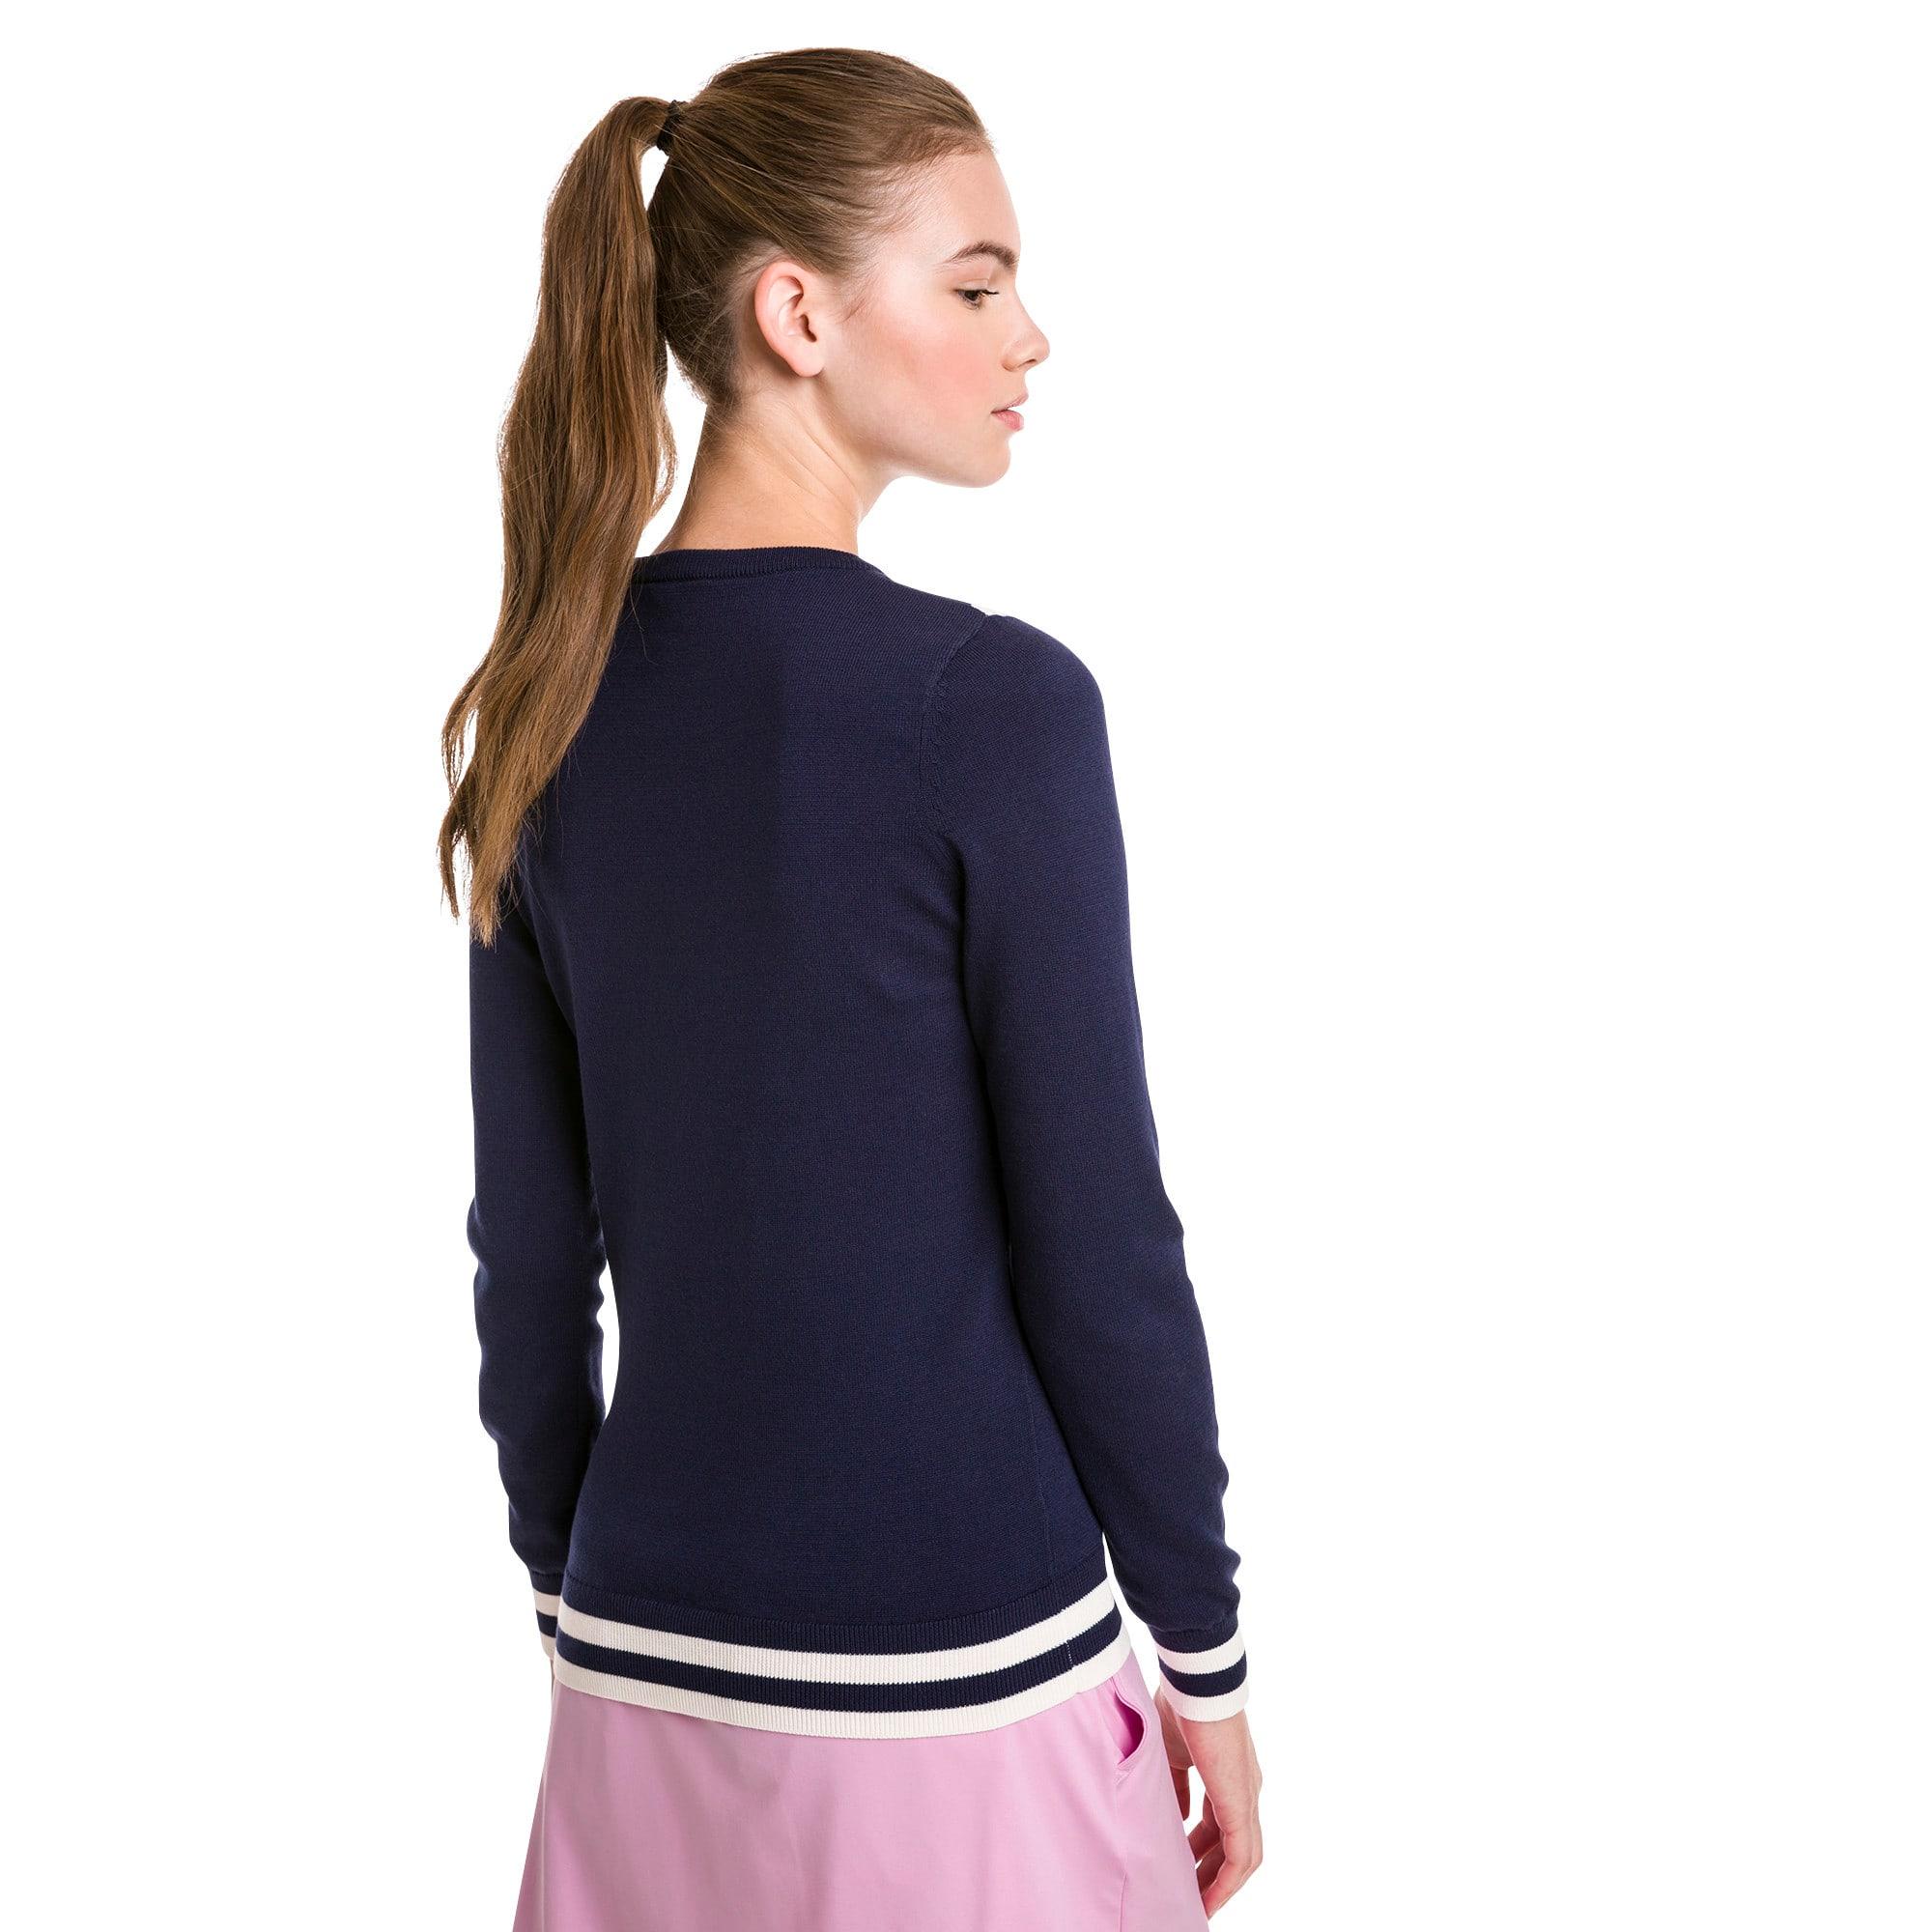 Thumbnail 2 of Chevron Women's Golf Sweater, Peacoat, medium